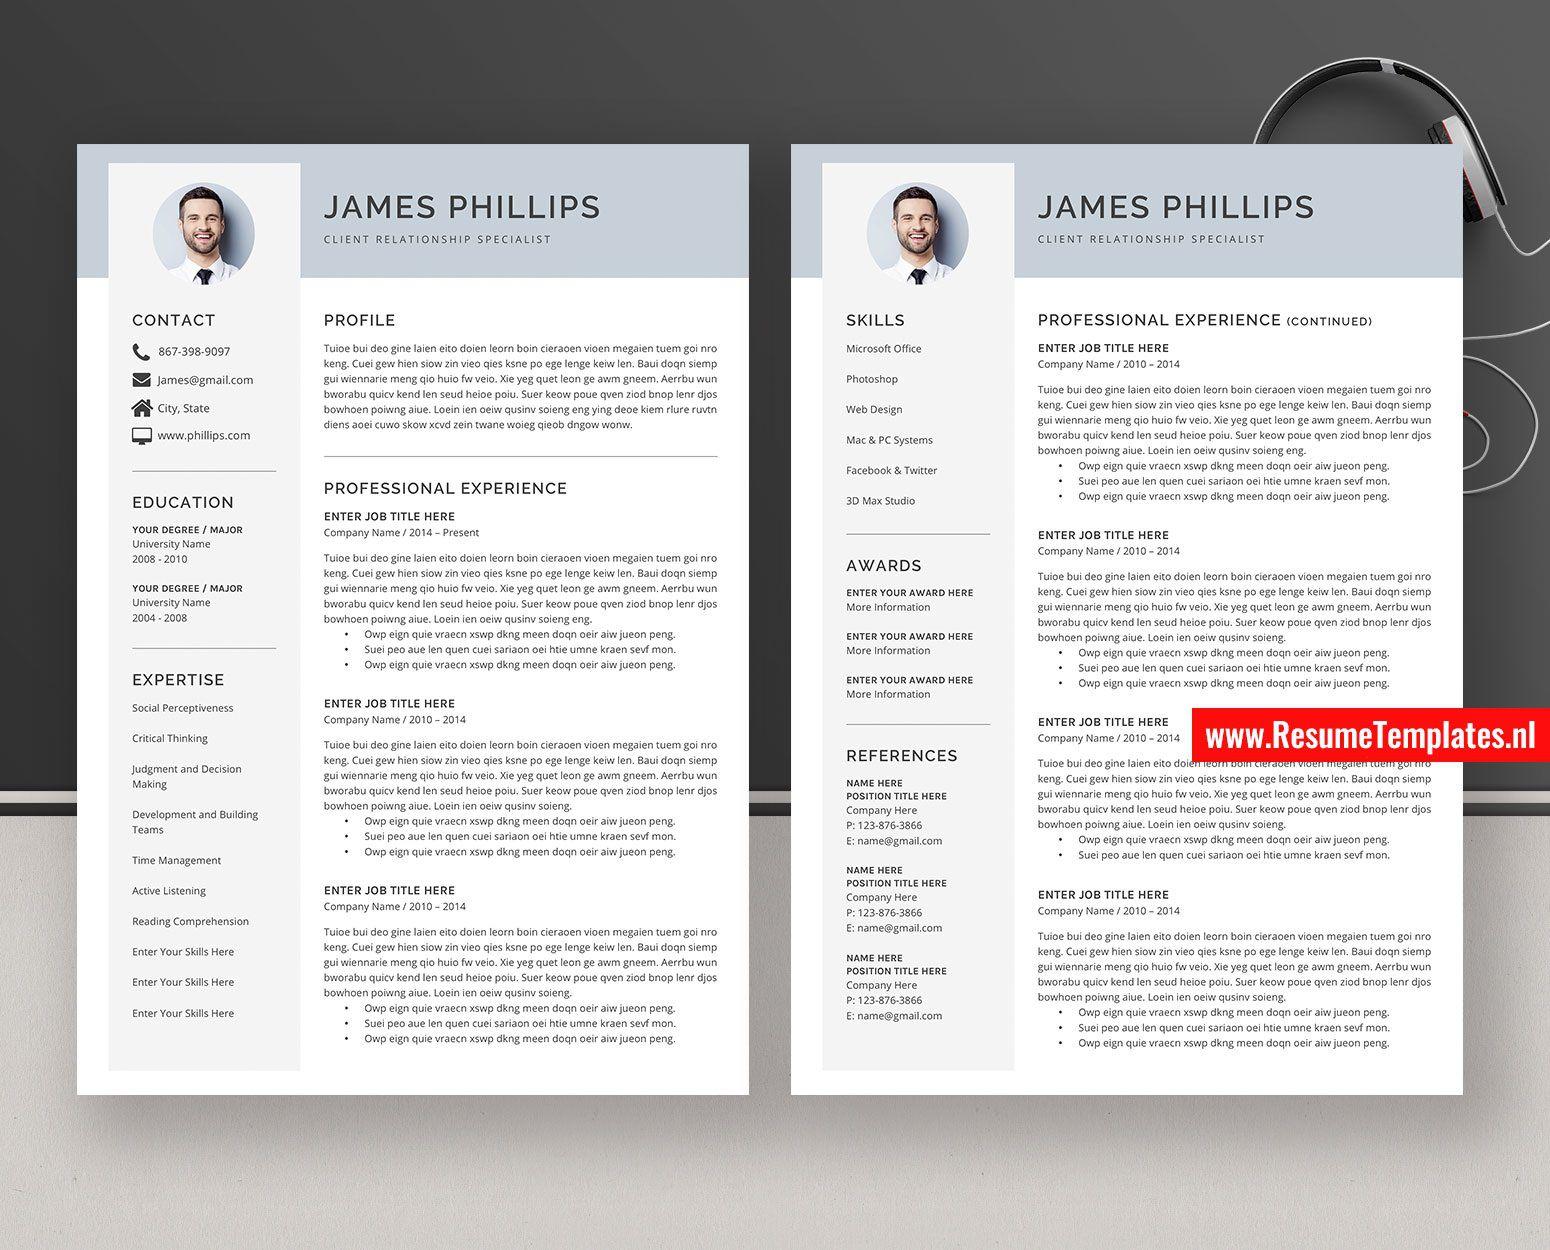 008 Simple Resume Template On Microsoft Word Photo  Sample 2007 Cv 2010Full